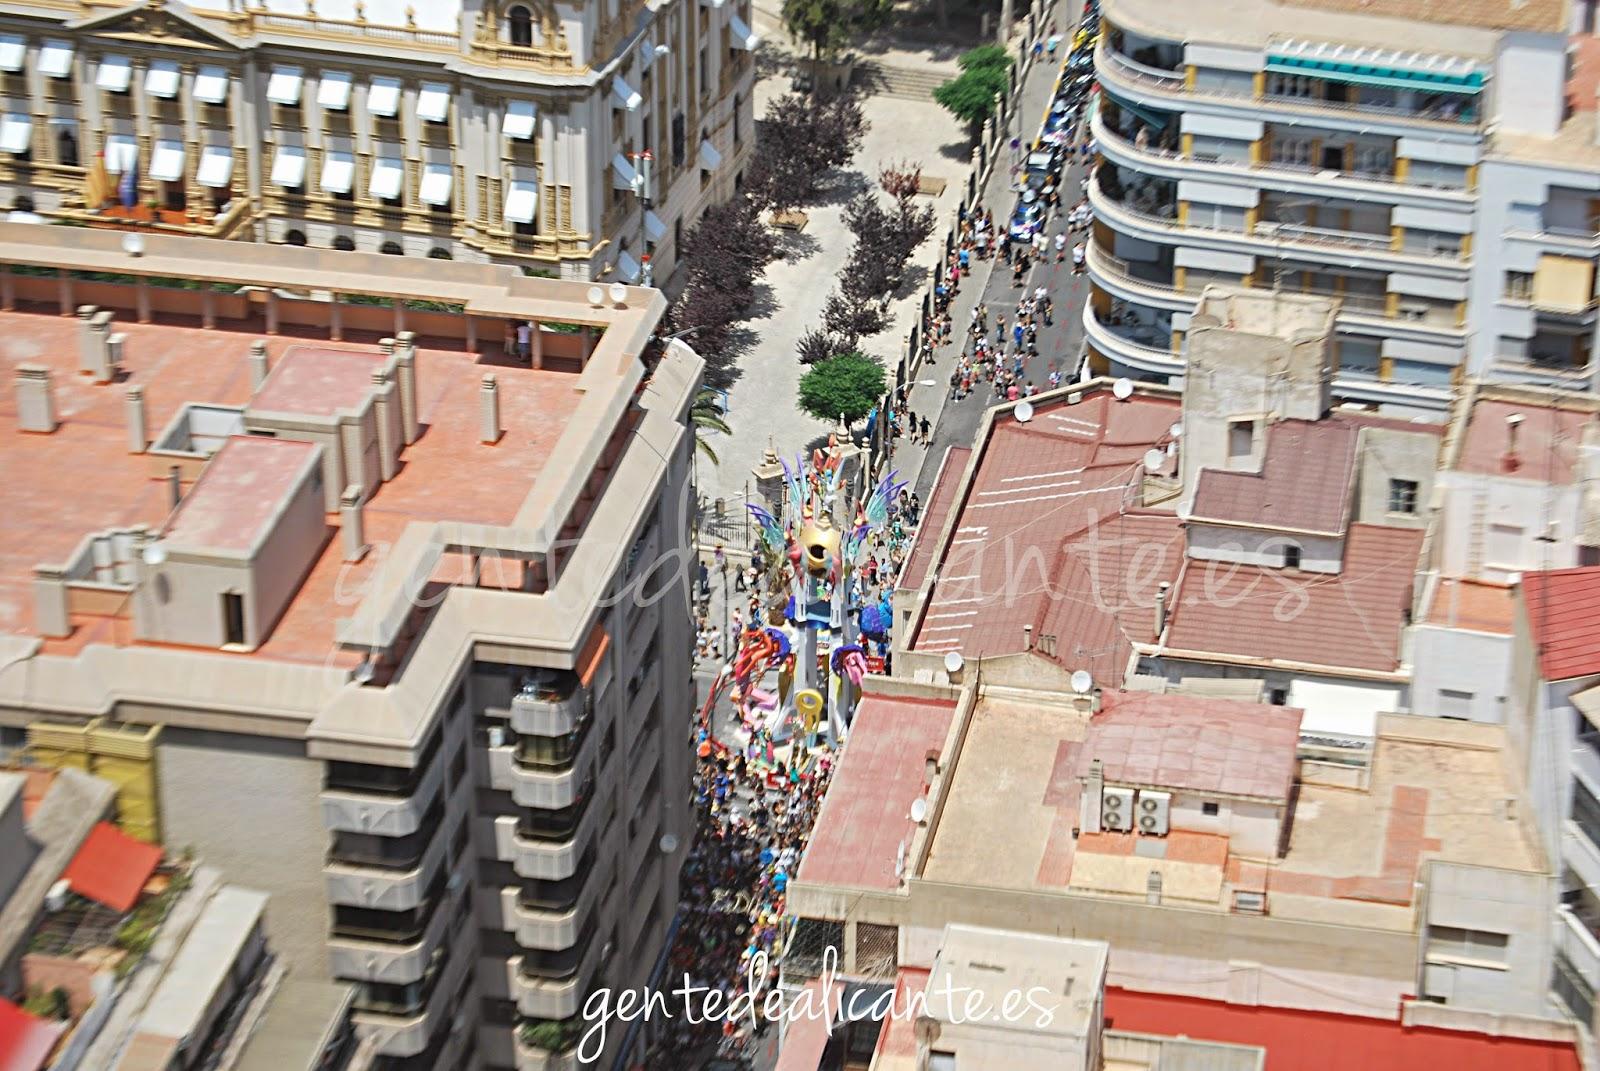 Hogueras-Alicante-Fogueres-gentedealicante-Foto